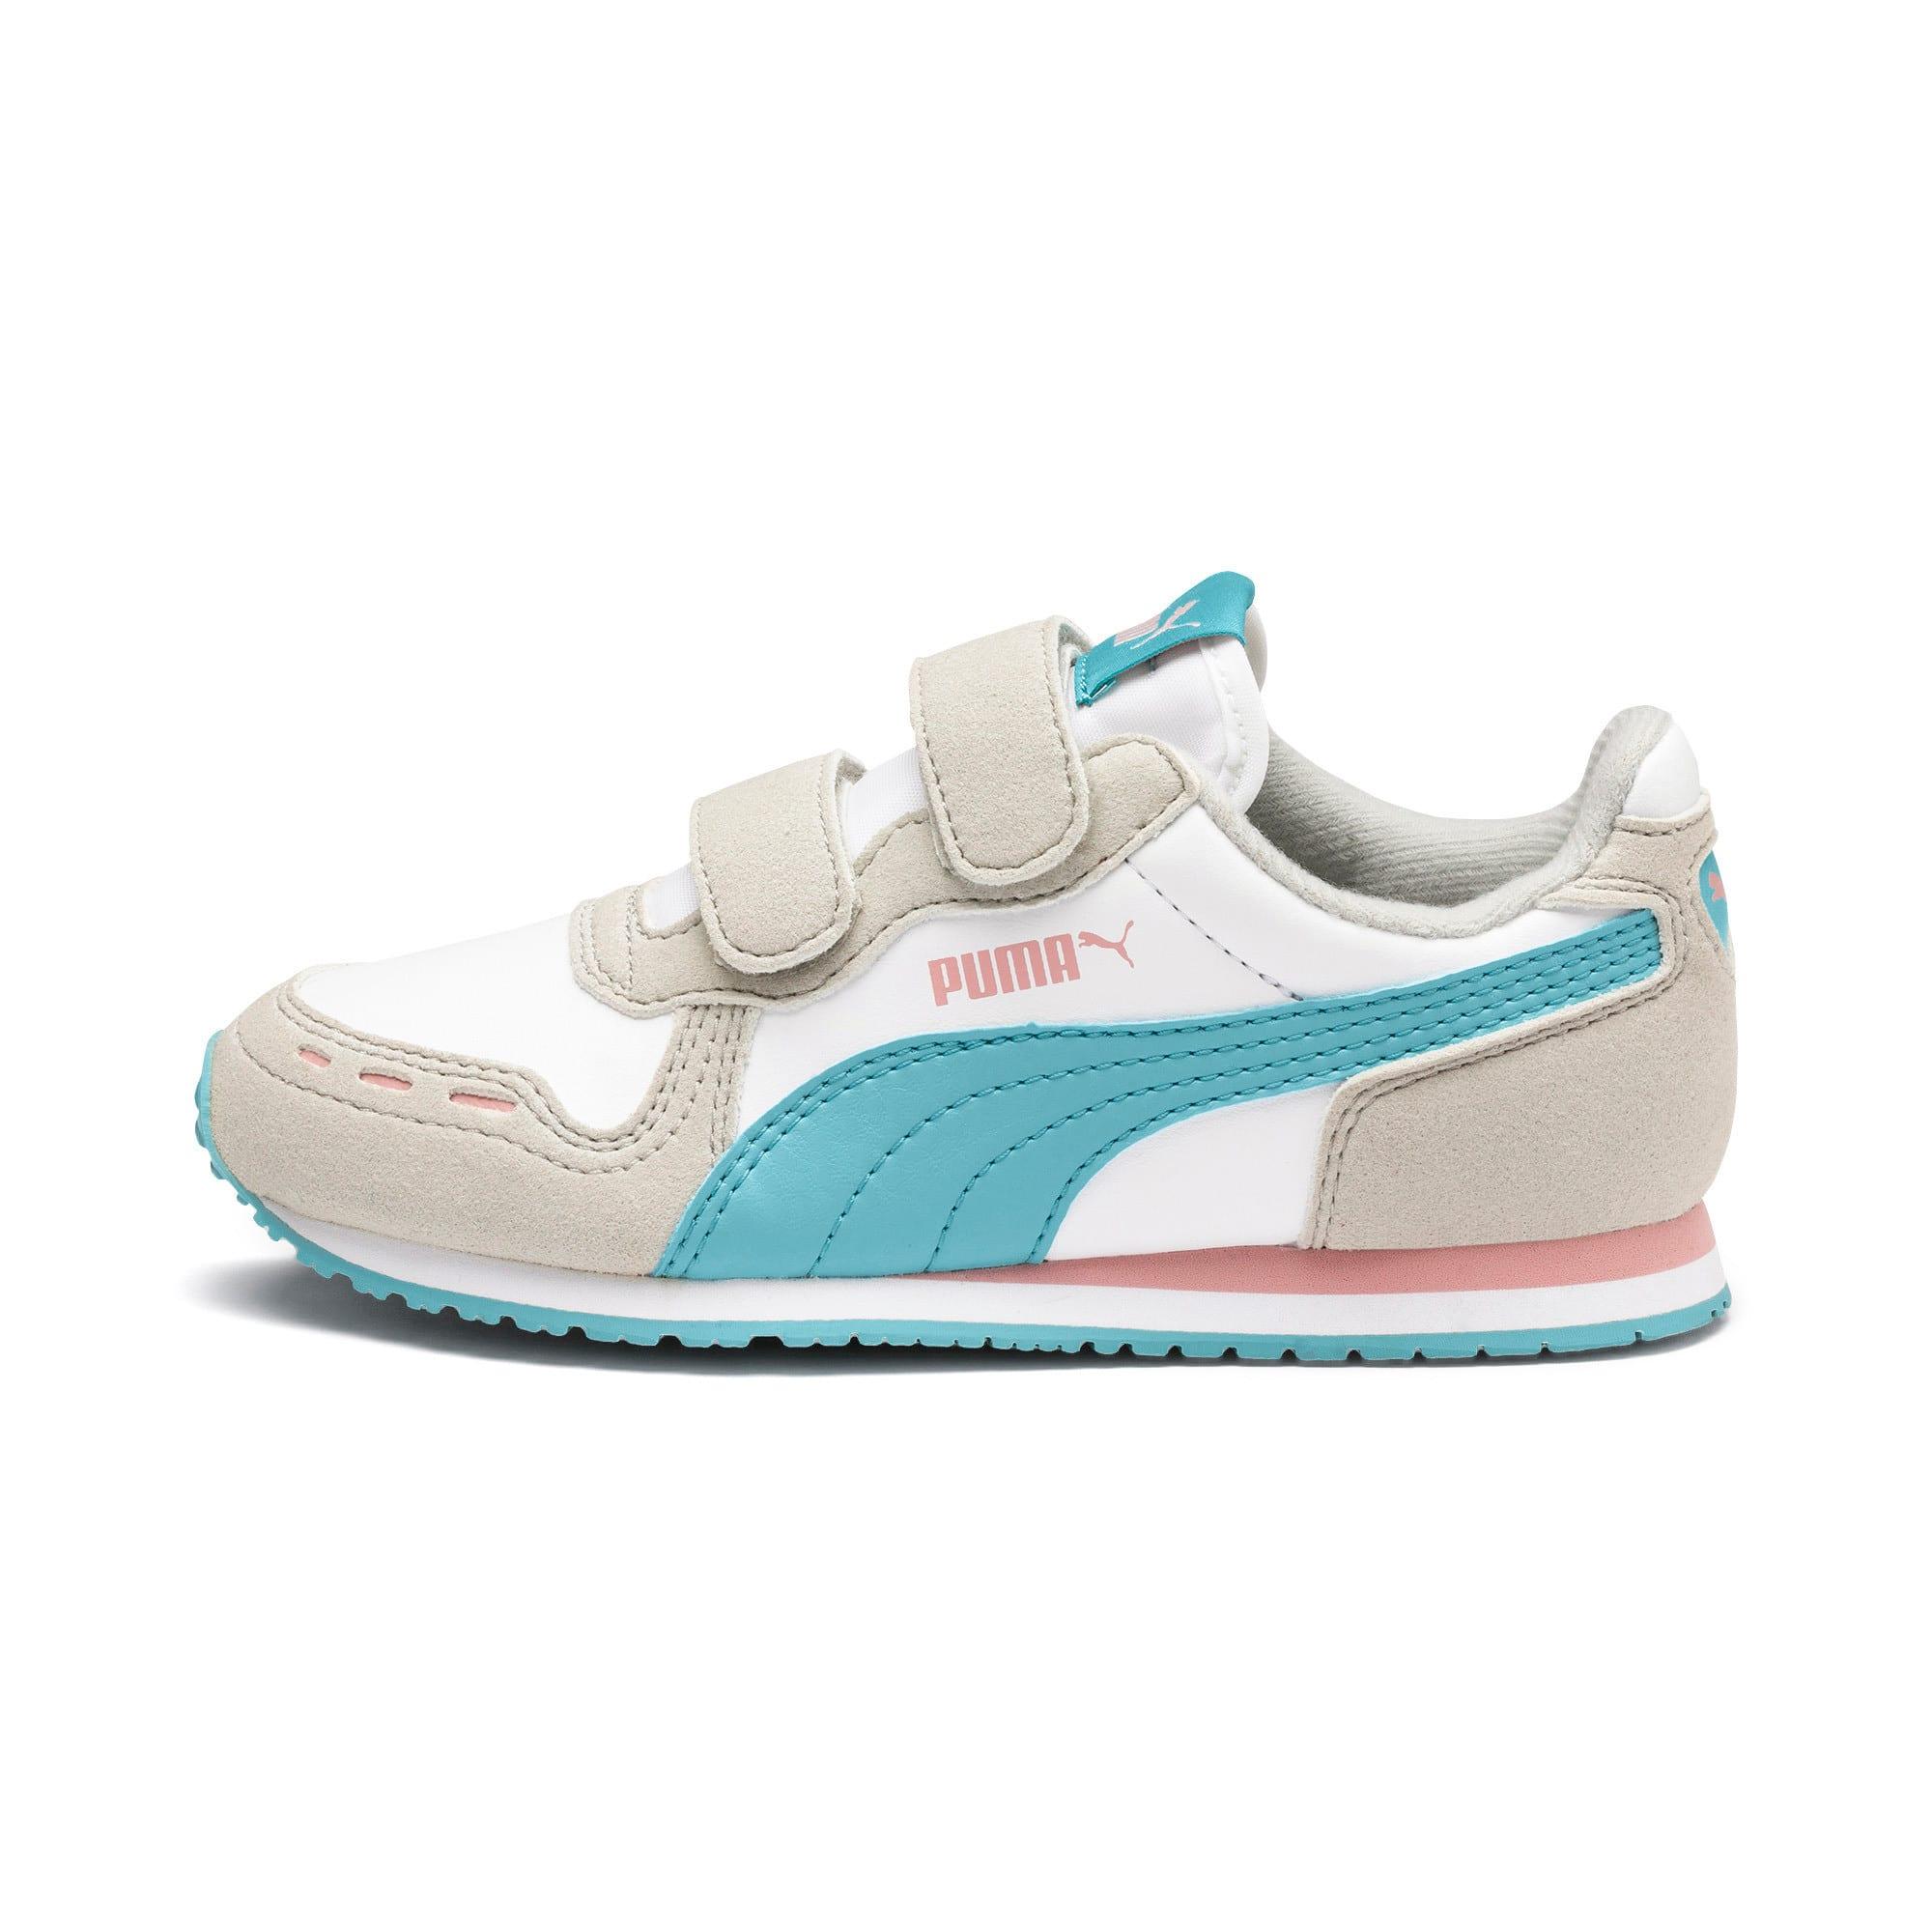 Thumbnail 1 of Cabana Racer SL AC Little Kids' Shoes, Puma White-Milky Blue, medium